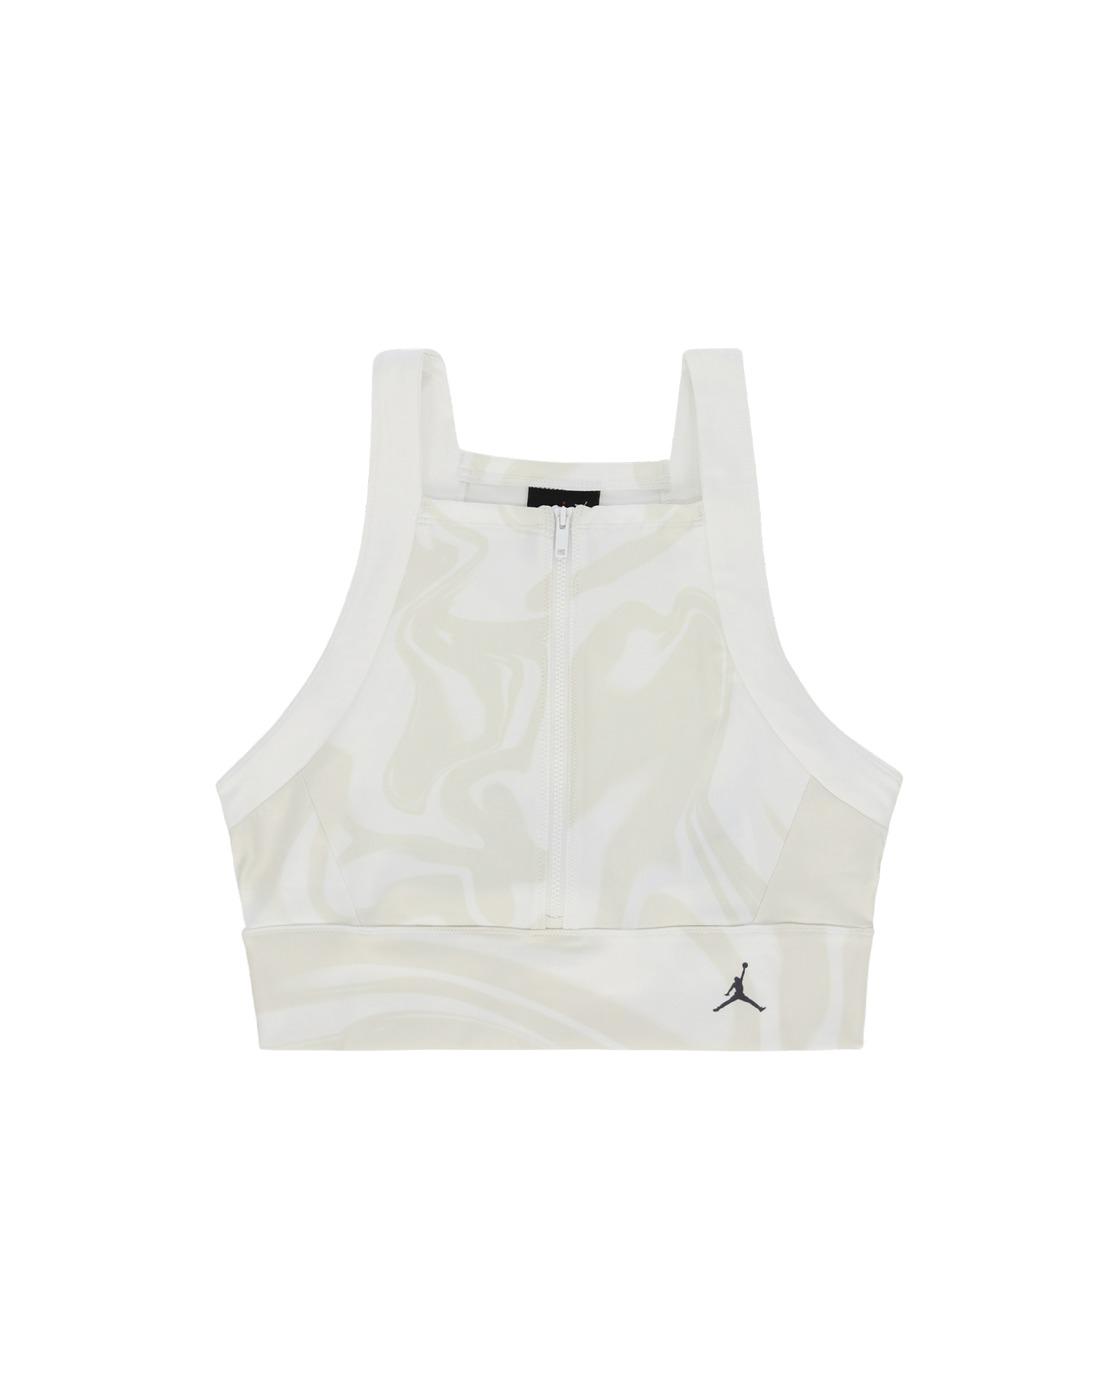 Nike Jordan Utility Crop Top White/Gridirion